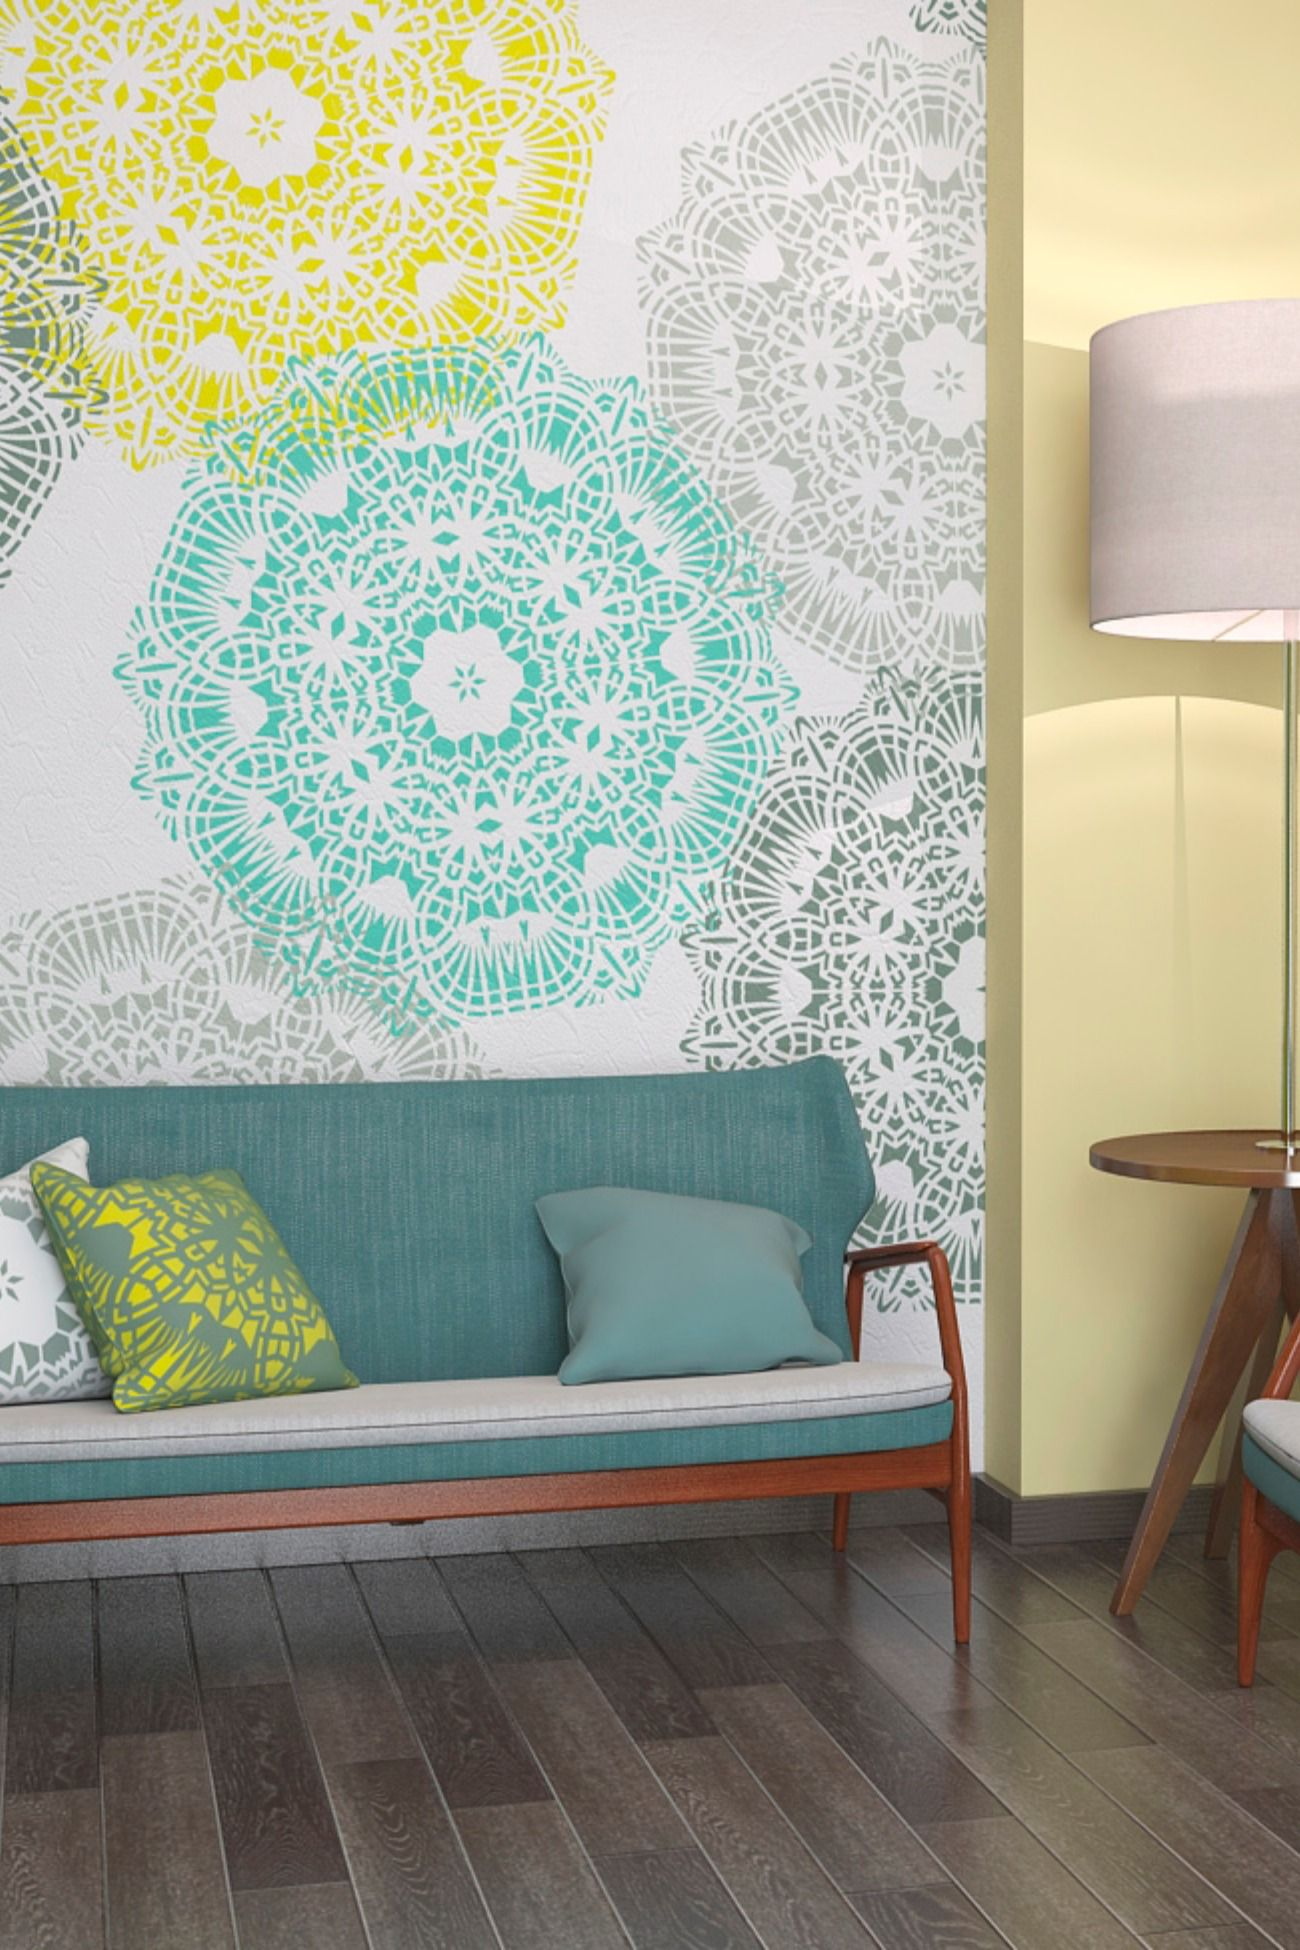 Mandala Style Stencil Unique Geometric Wall Painting Stencil Stencil Painting On Walls Cheap Living Room Furniture Mandala Wall Stencil #wall #painting #stencils #for #living #room